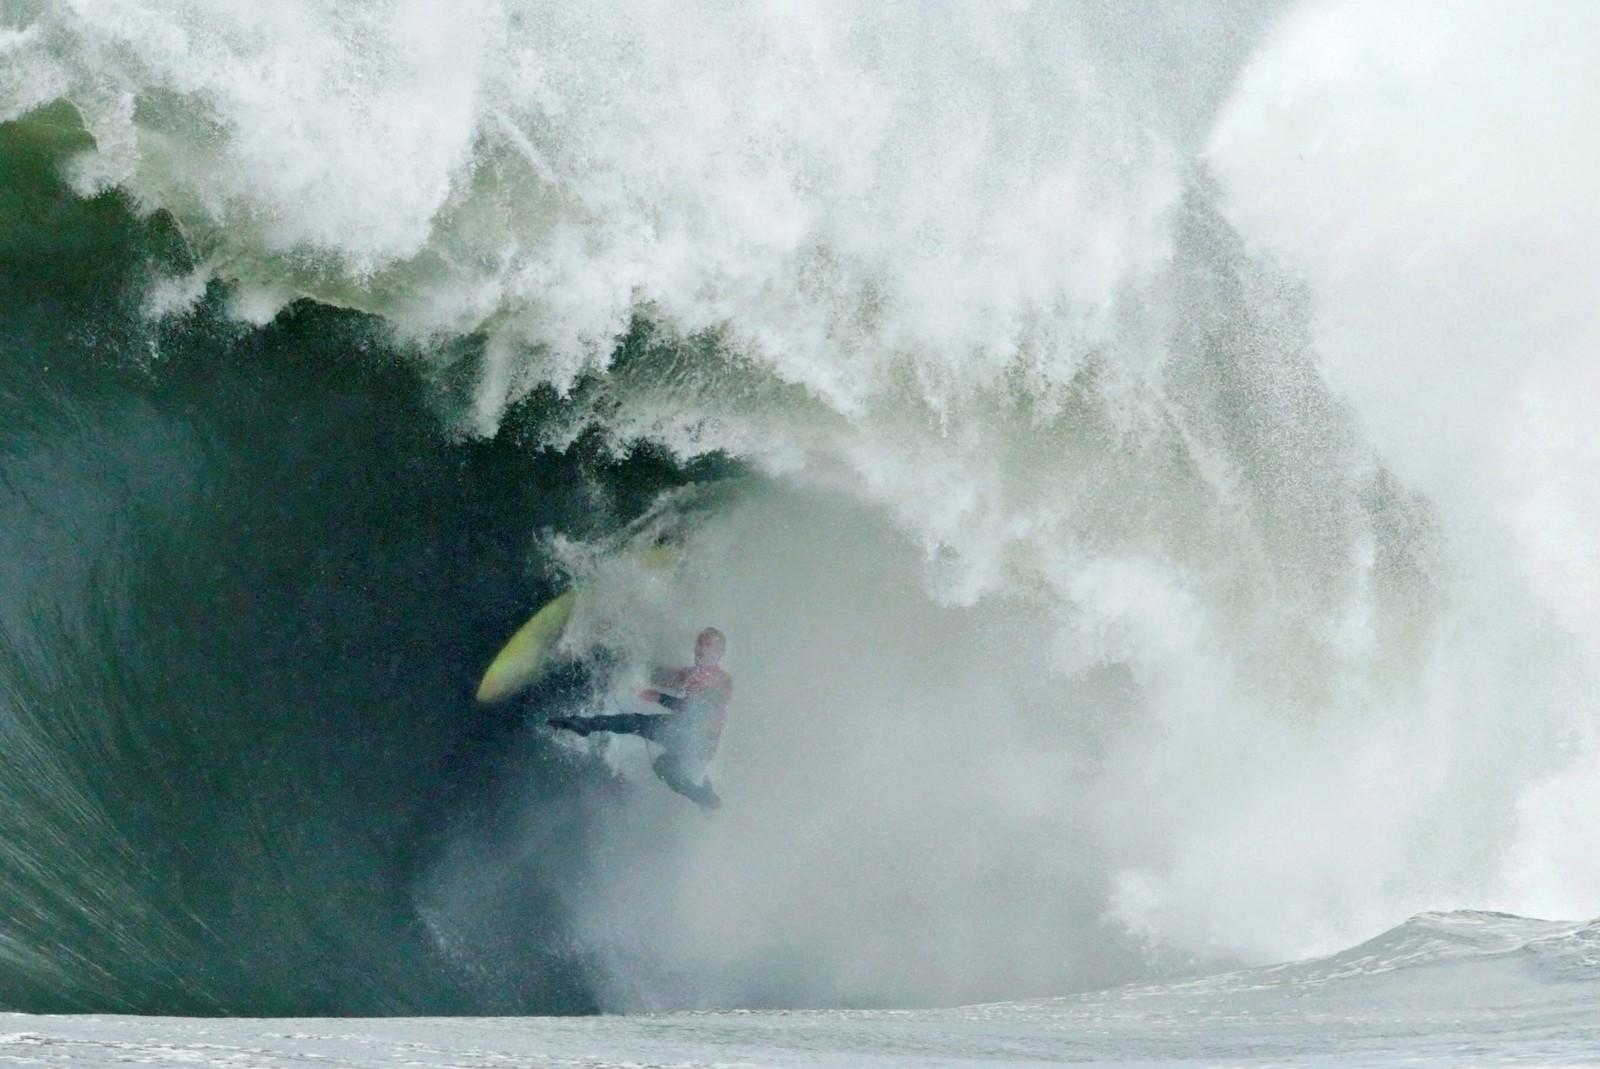 Den australske surferen Justen Allport blir tatt av bølgen under en surfekonkurranse ved Cape Solander i Sydney mandag.